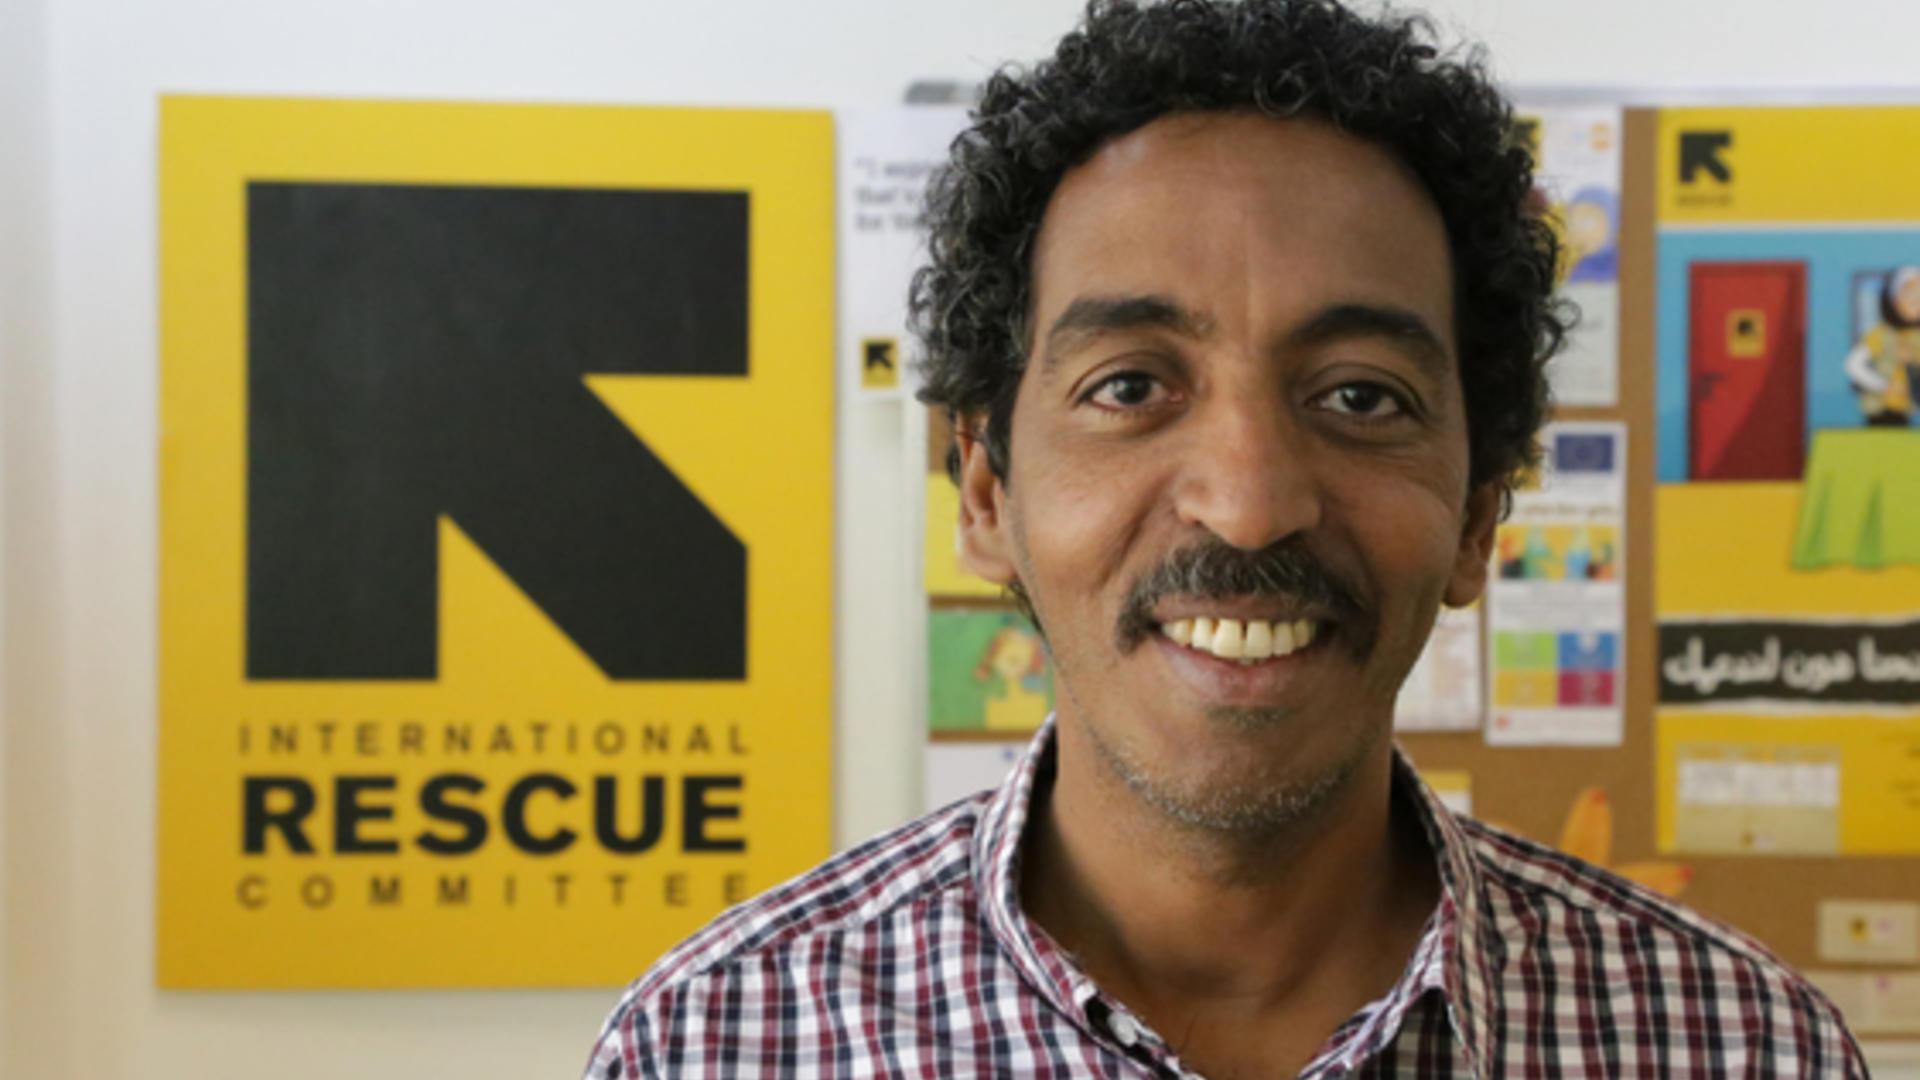 IRC aid worker Mustafa Hassan